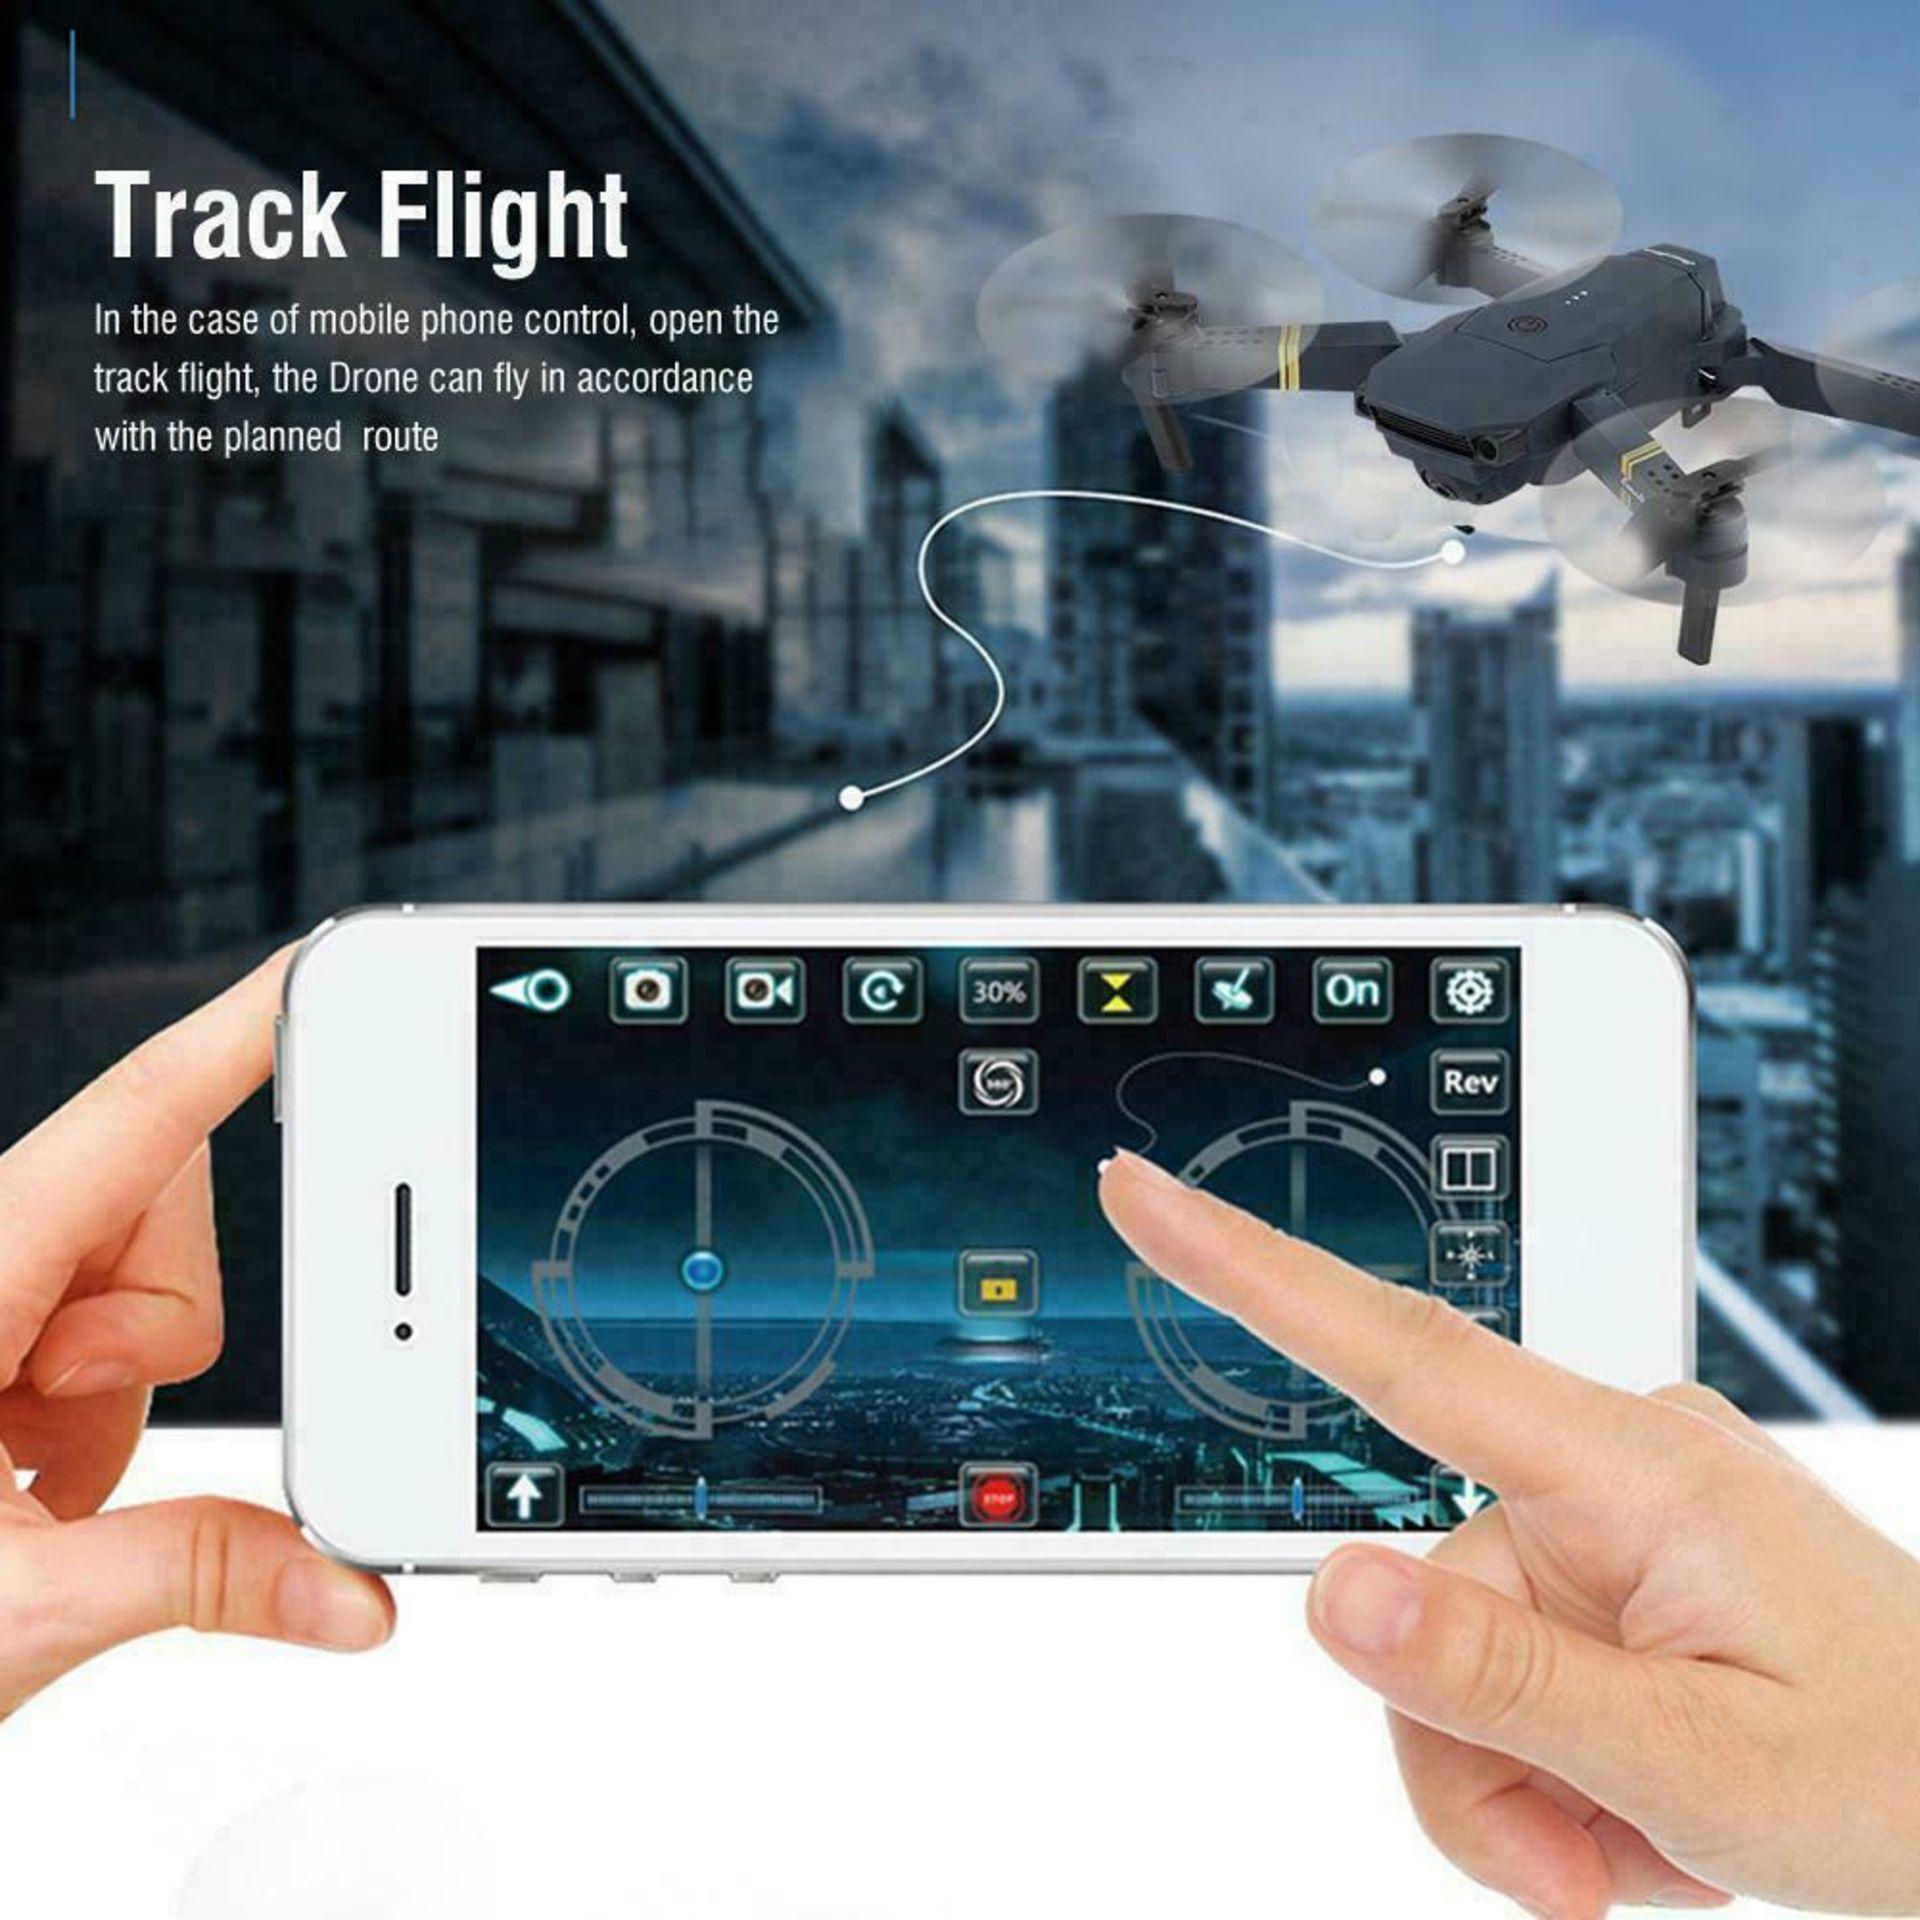 NEW & UNUSED DRONE X PRO WIFI FPV 1080P HD CAMERA FOLDABLE RC QUADCOPTER + BAG *PLUS VAT* - Image 7 of 9